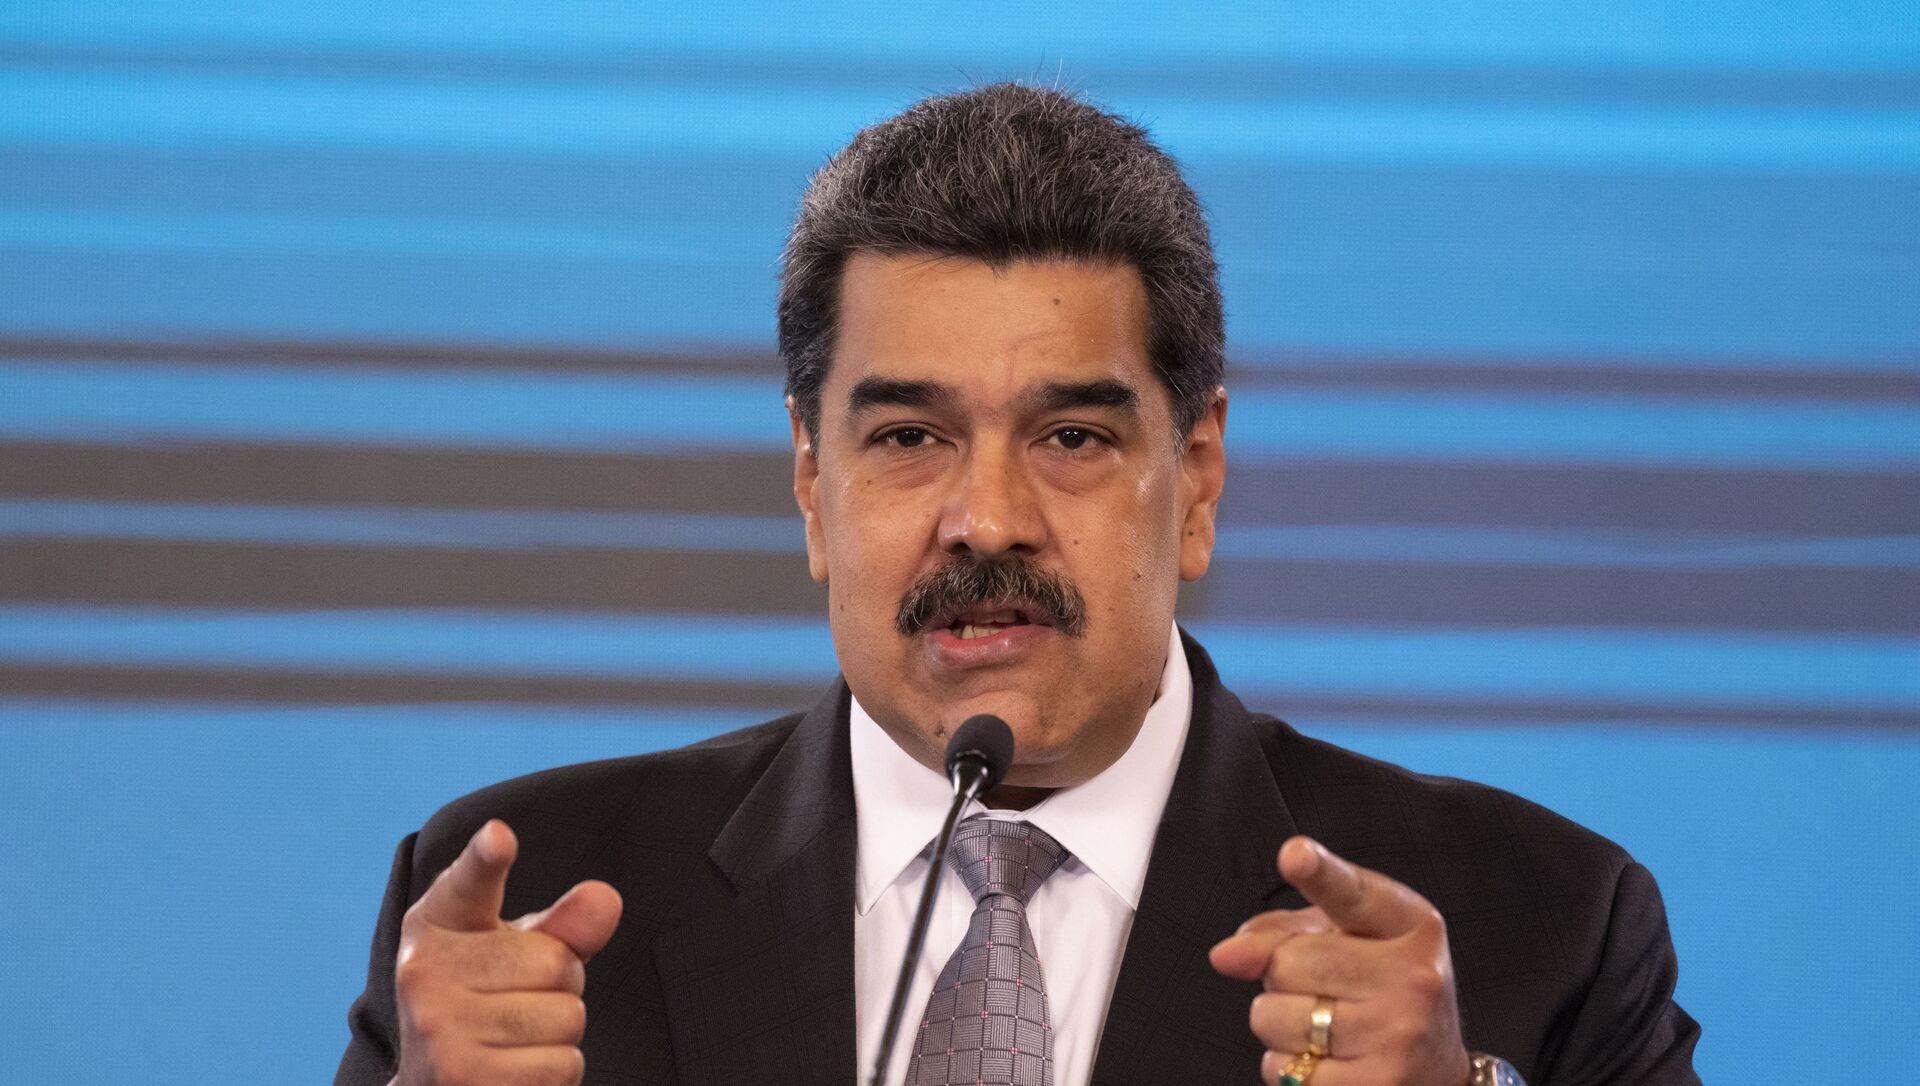 Conferenza stampa del Presidente venezuelano Nicolas Maduro al palazzo presidenziale Miraflores di Caracas, 17 febbraio 2021 - Sputnik Italia, 1920, 29.03.2021